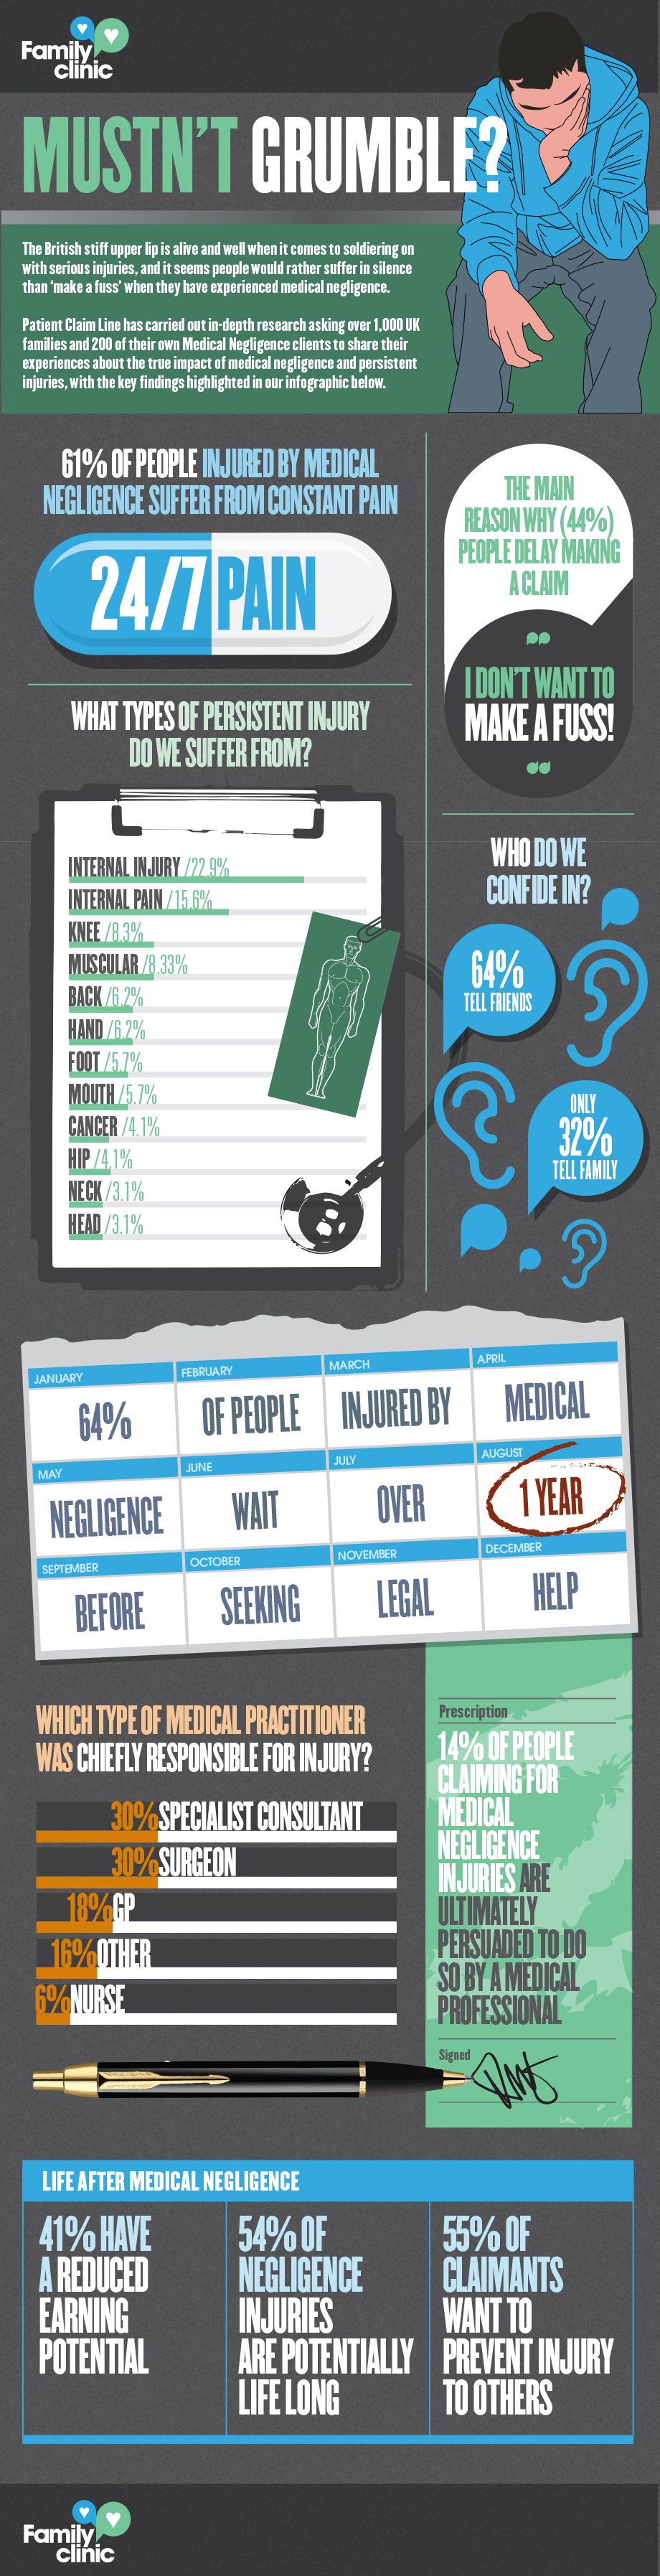 Medical Negligence in UK